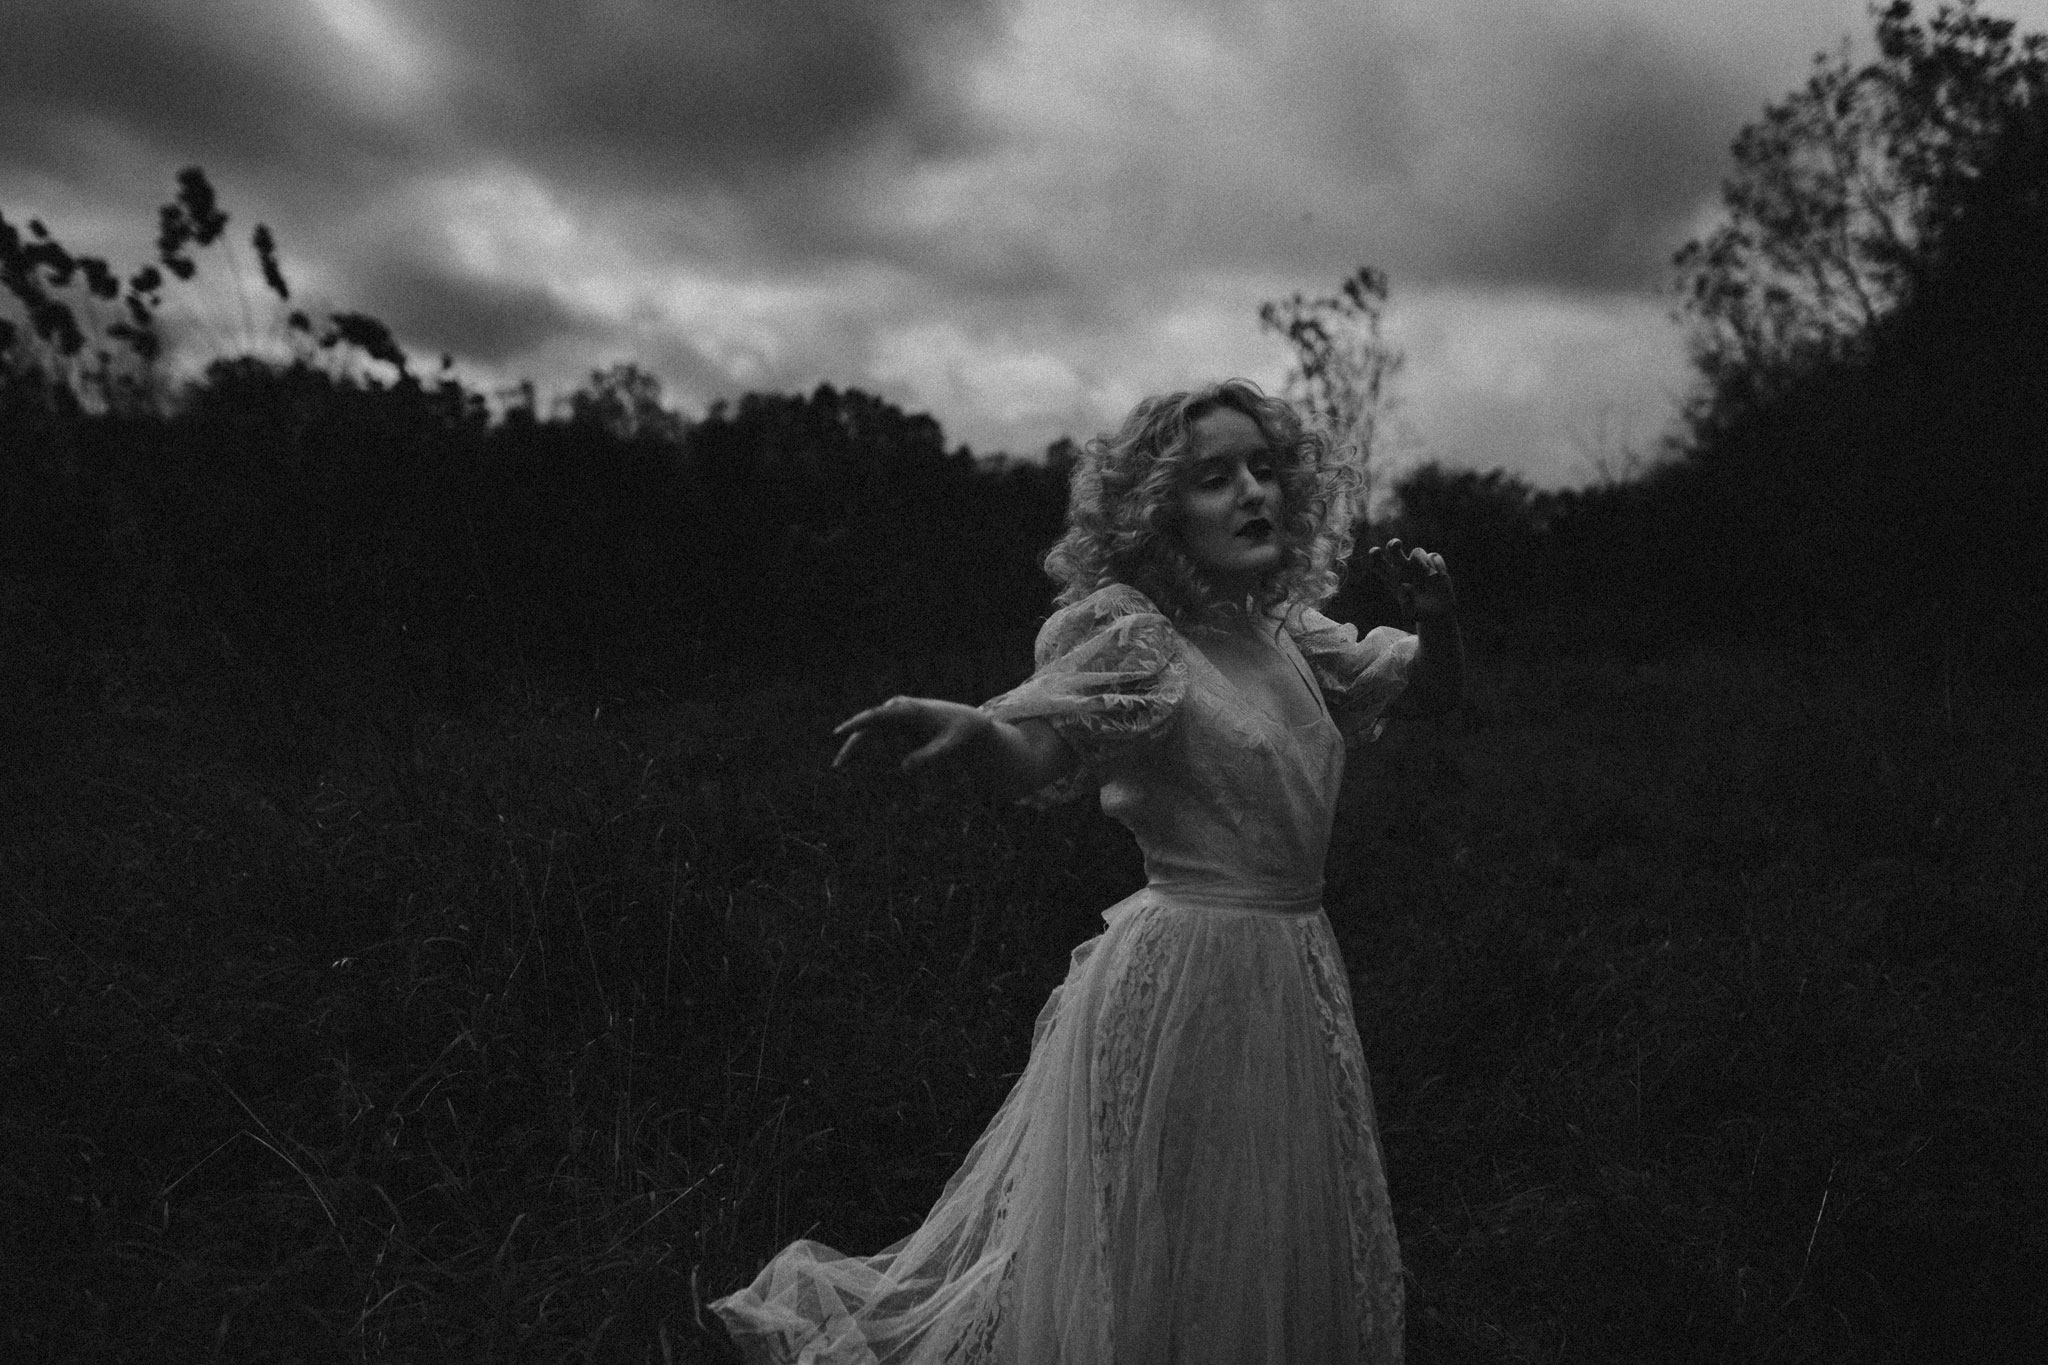 pale-witch-046fb.jpg